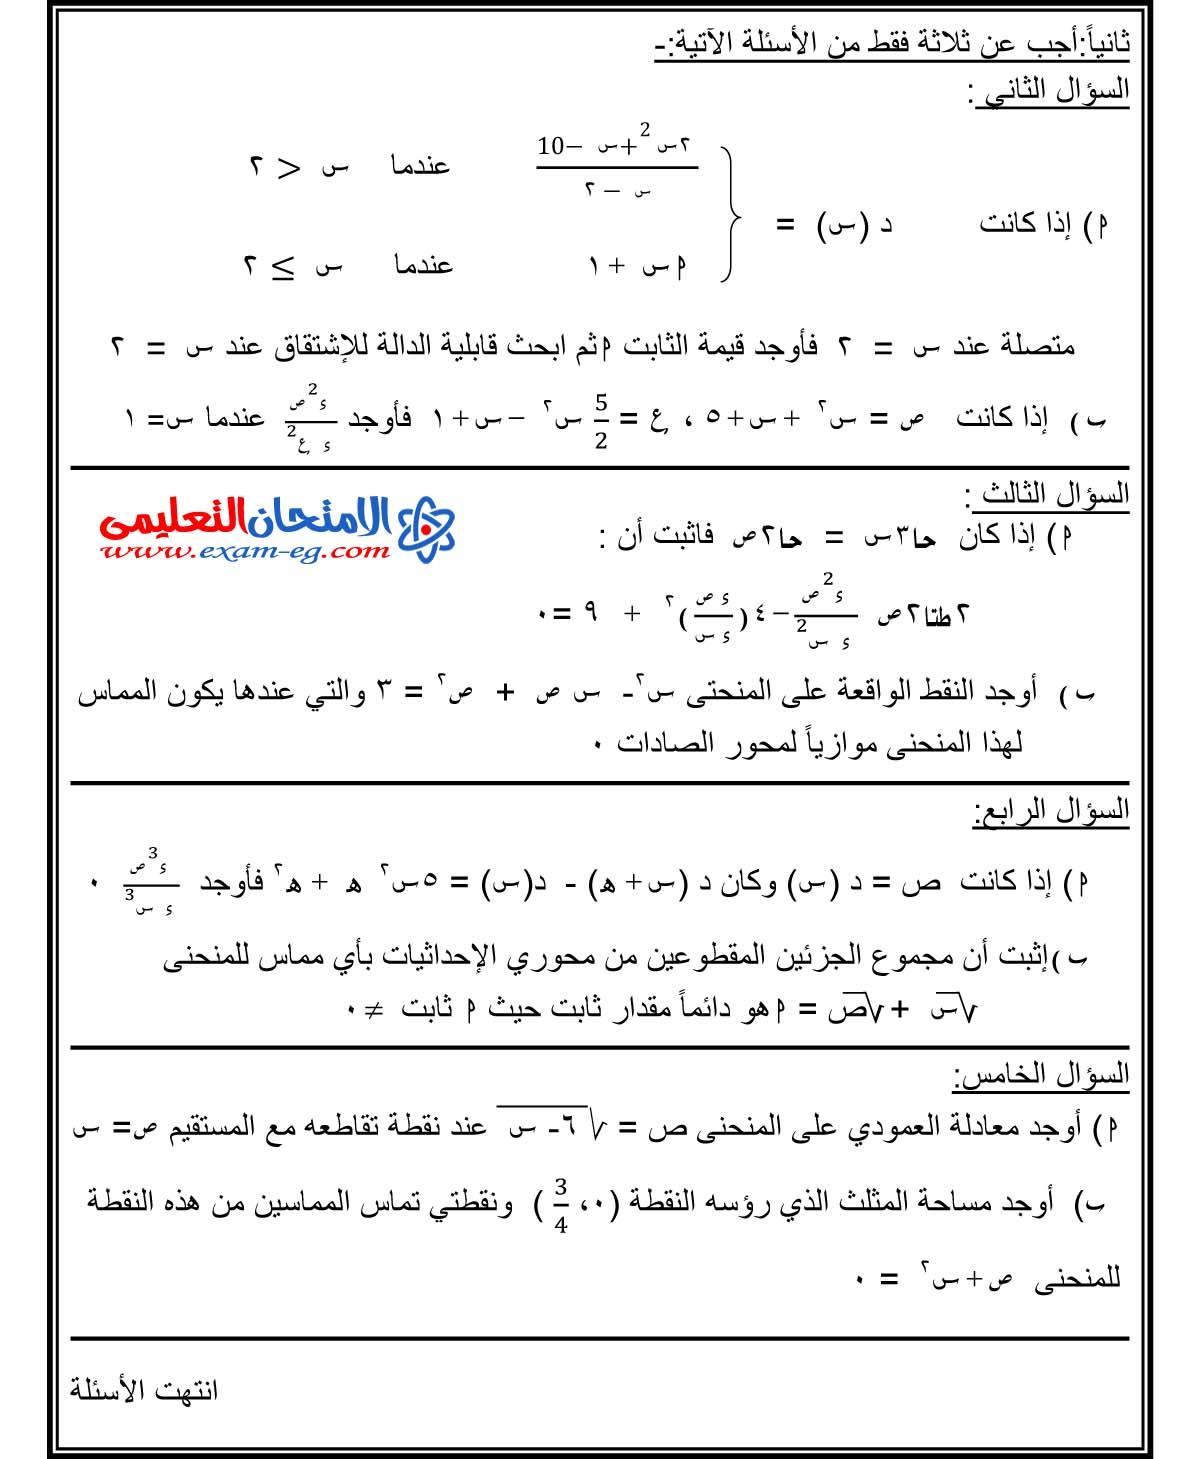 exam-eg.com_1460419970612.jpg